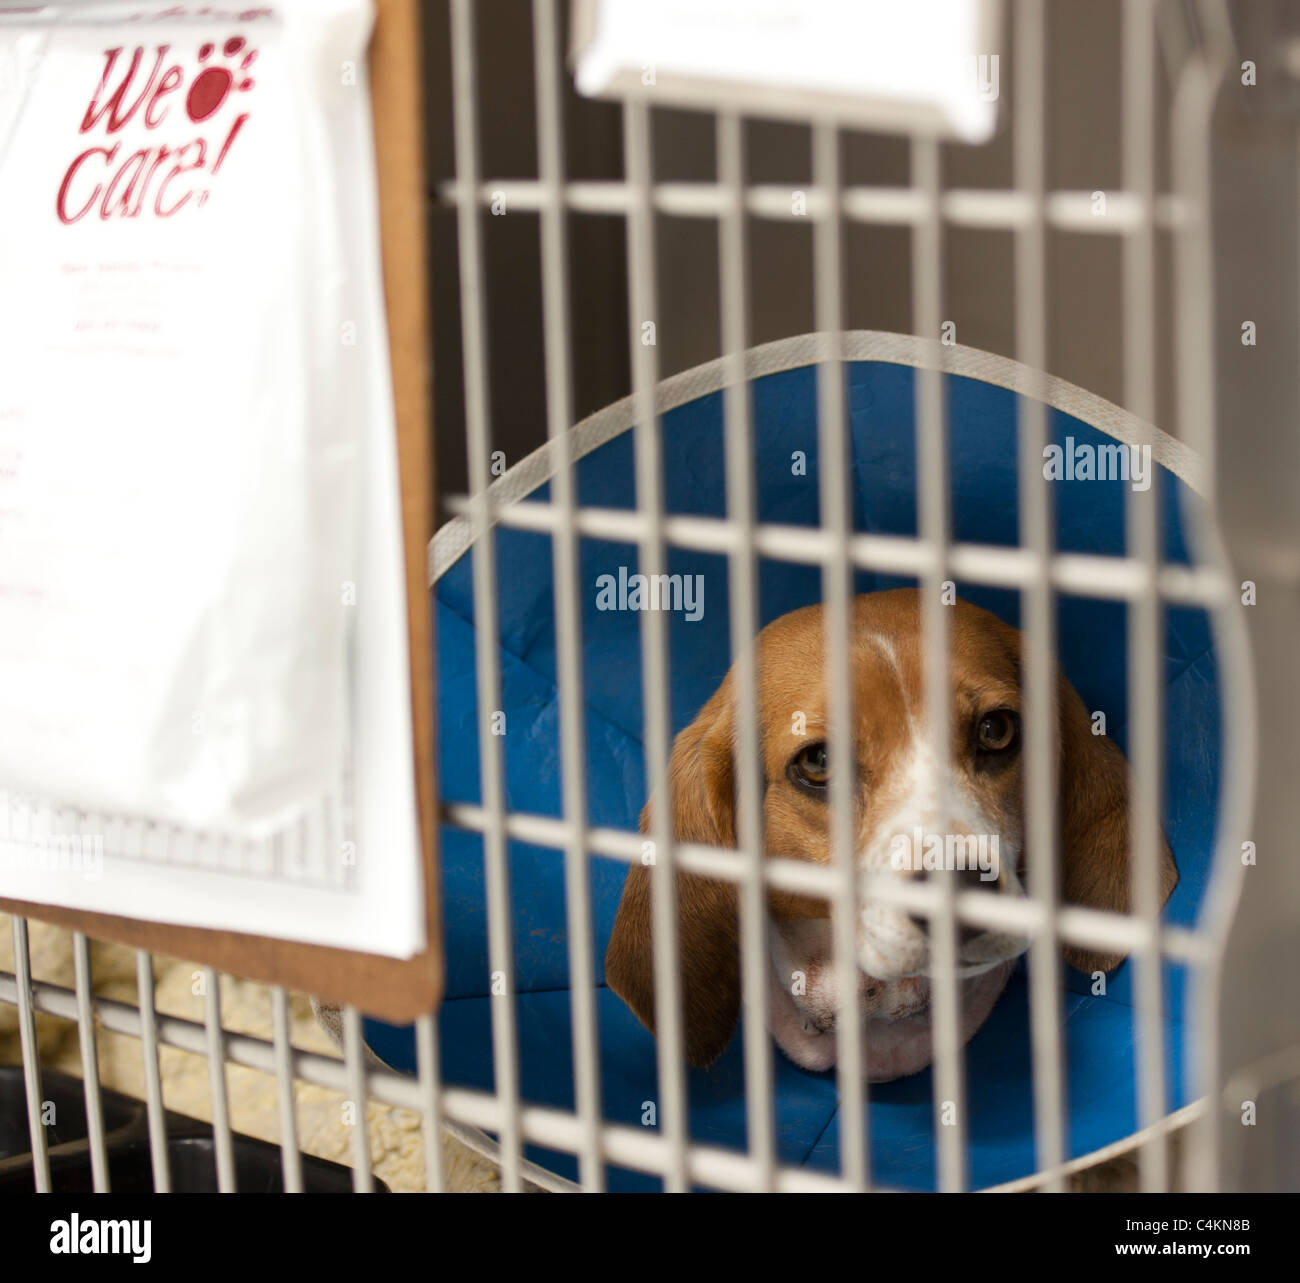 a beagle recuperating at a vet's hospital - Stock Image